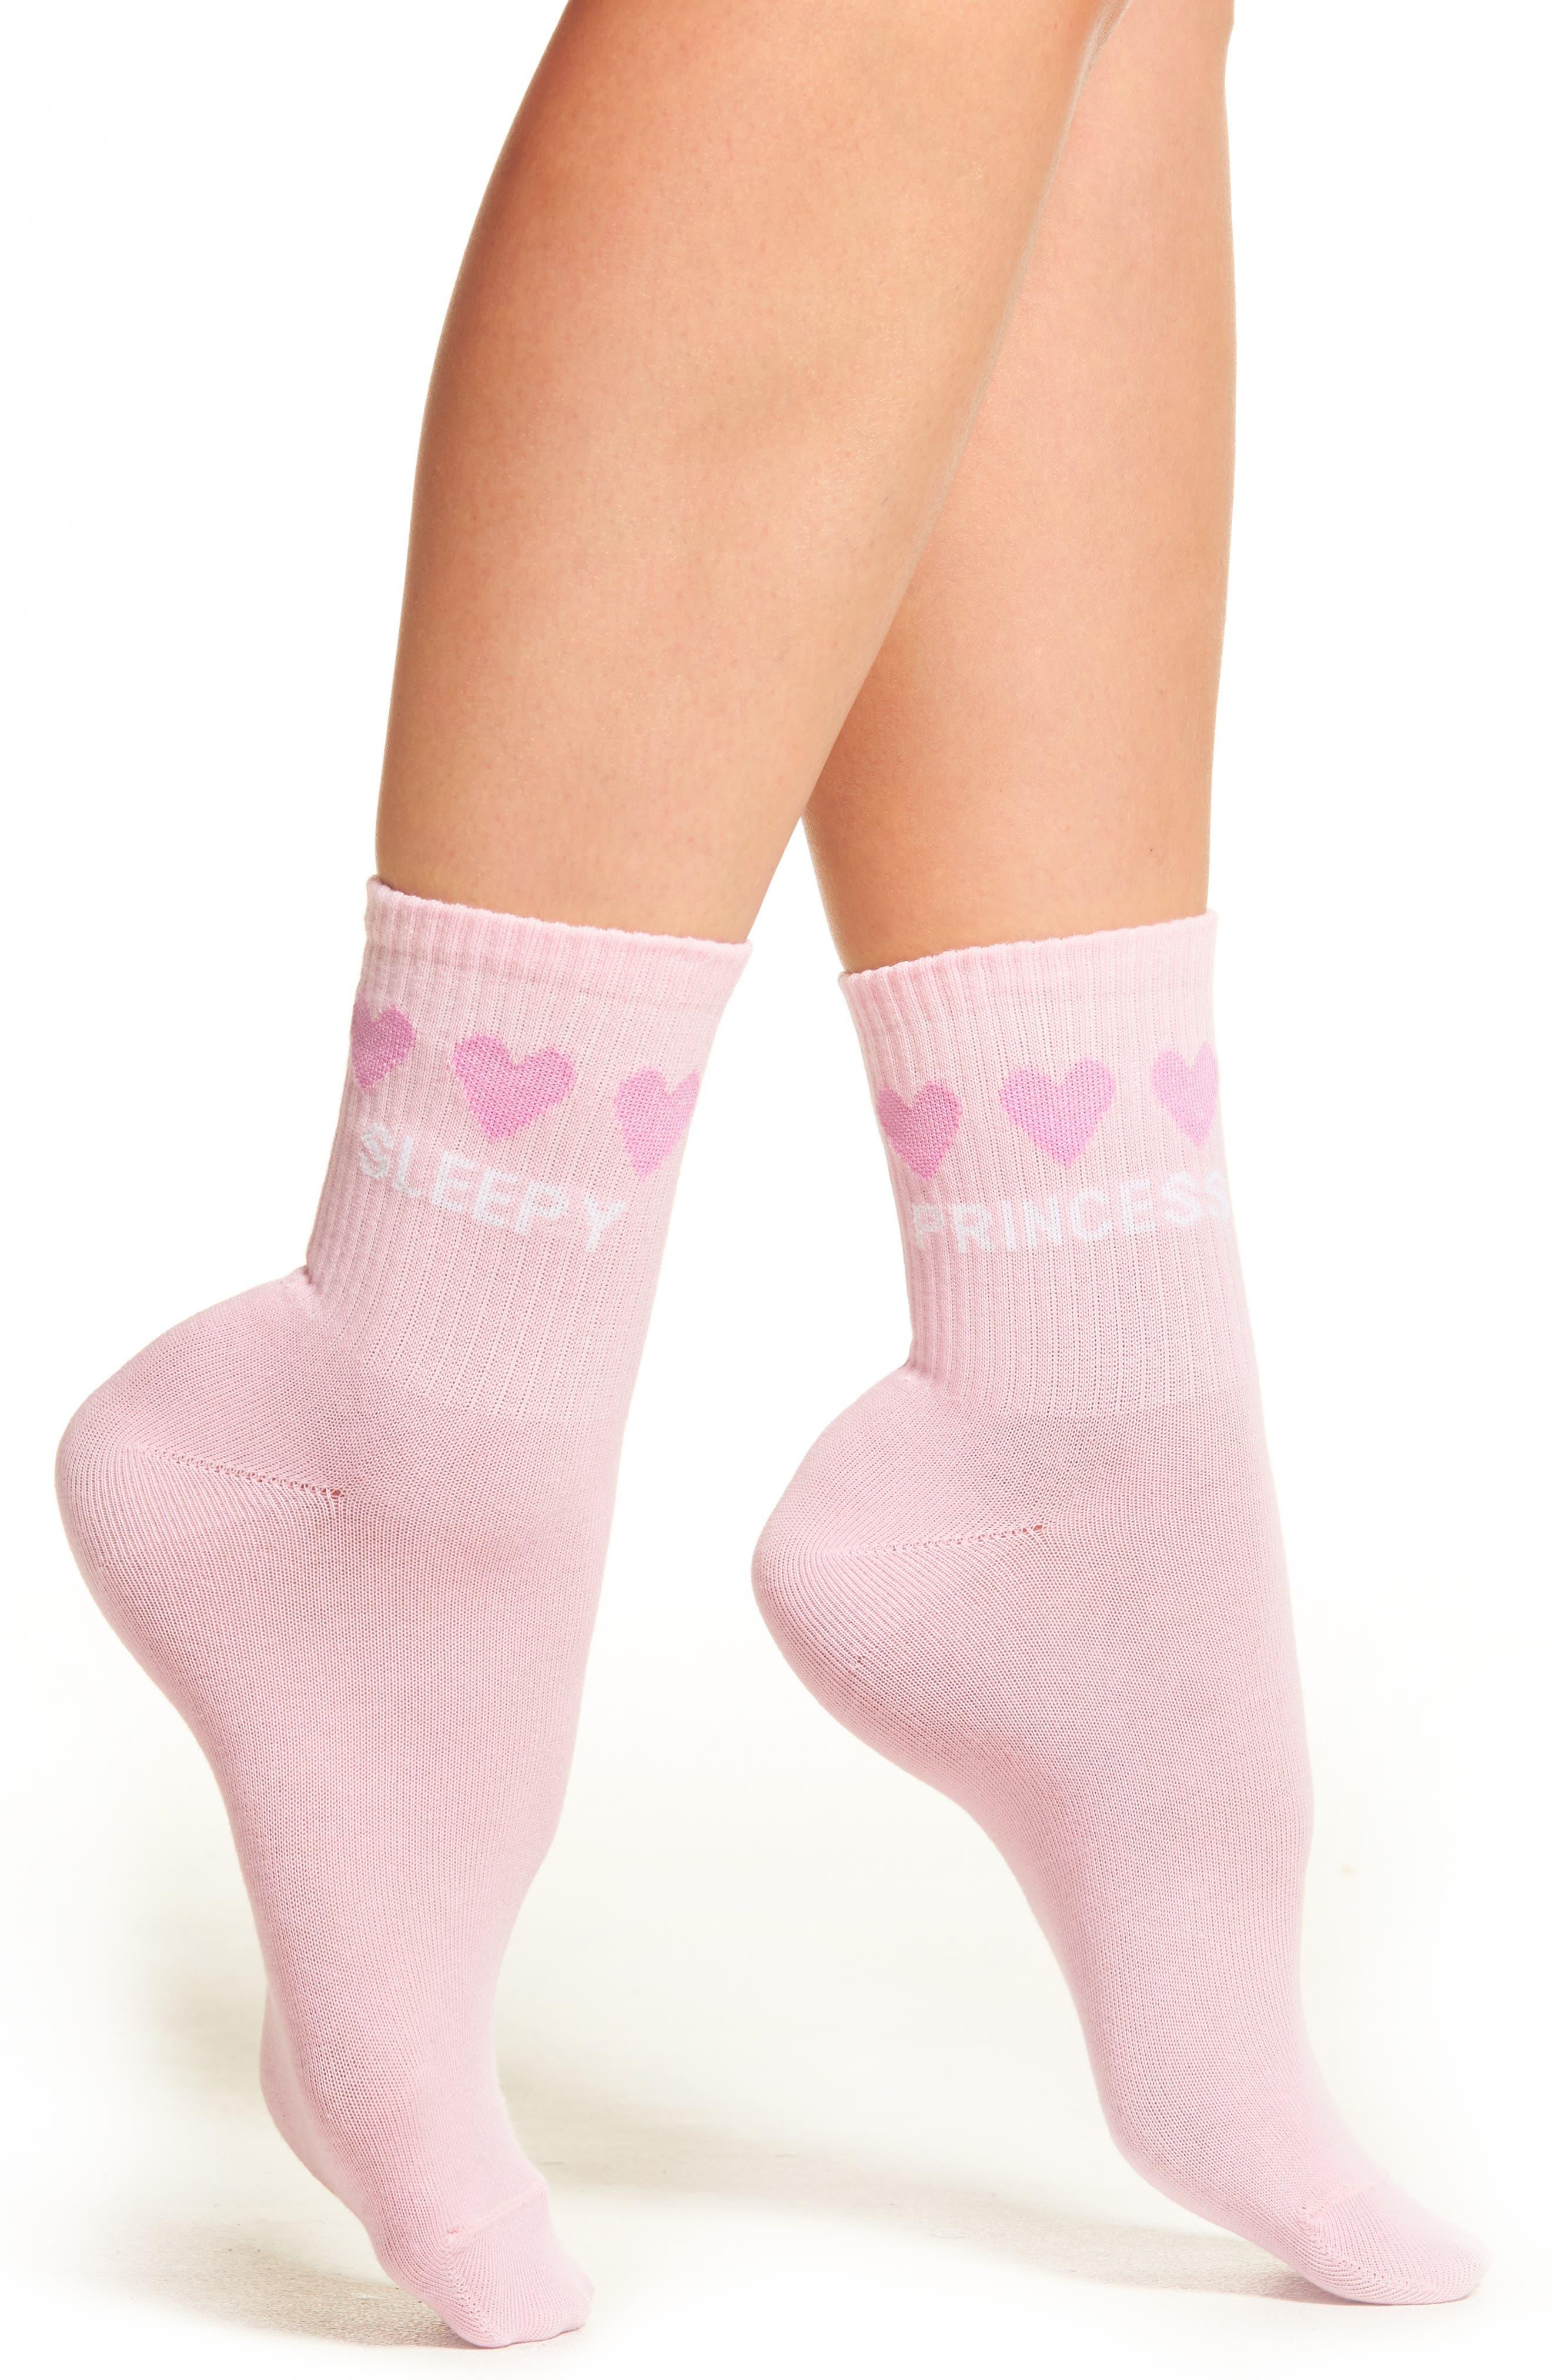 Sleepy Socks,                         Main,                         color, Pink